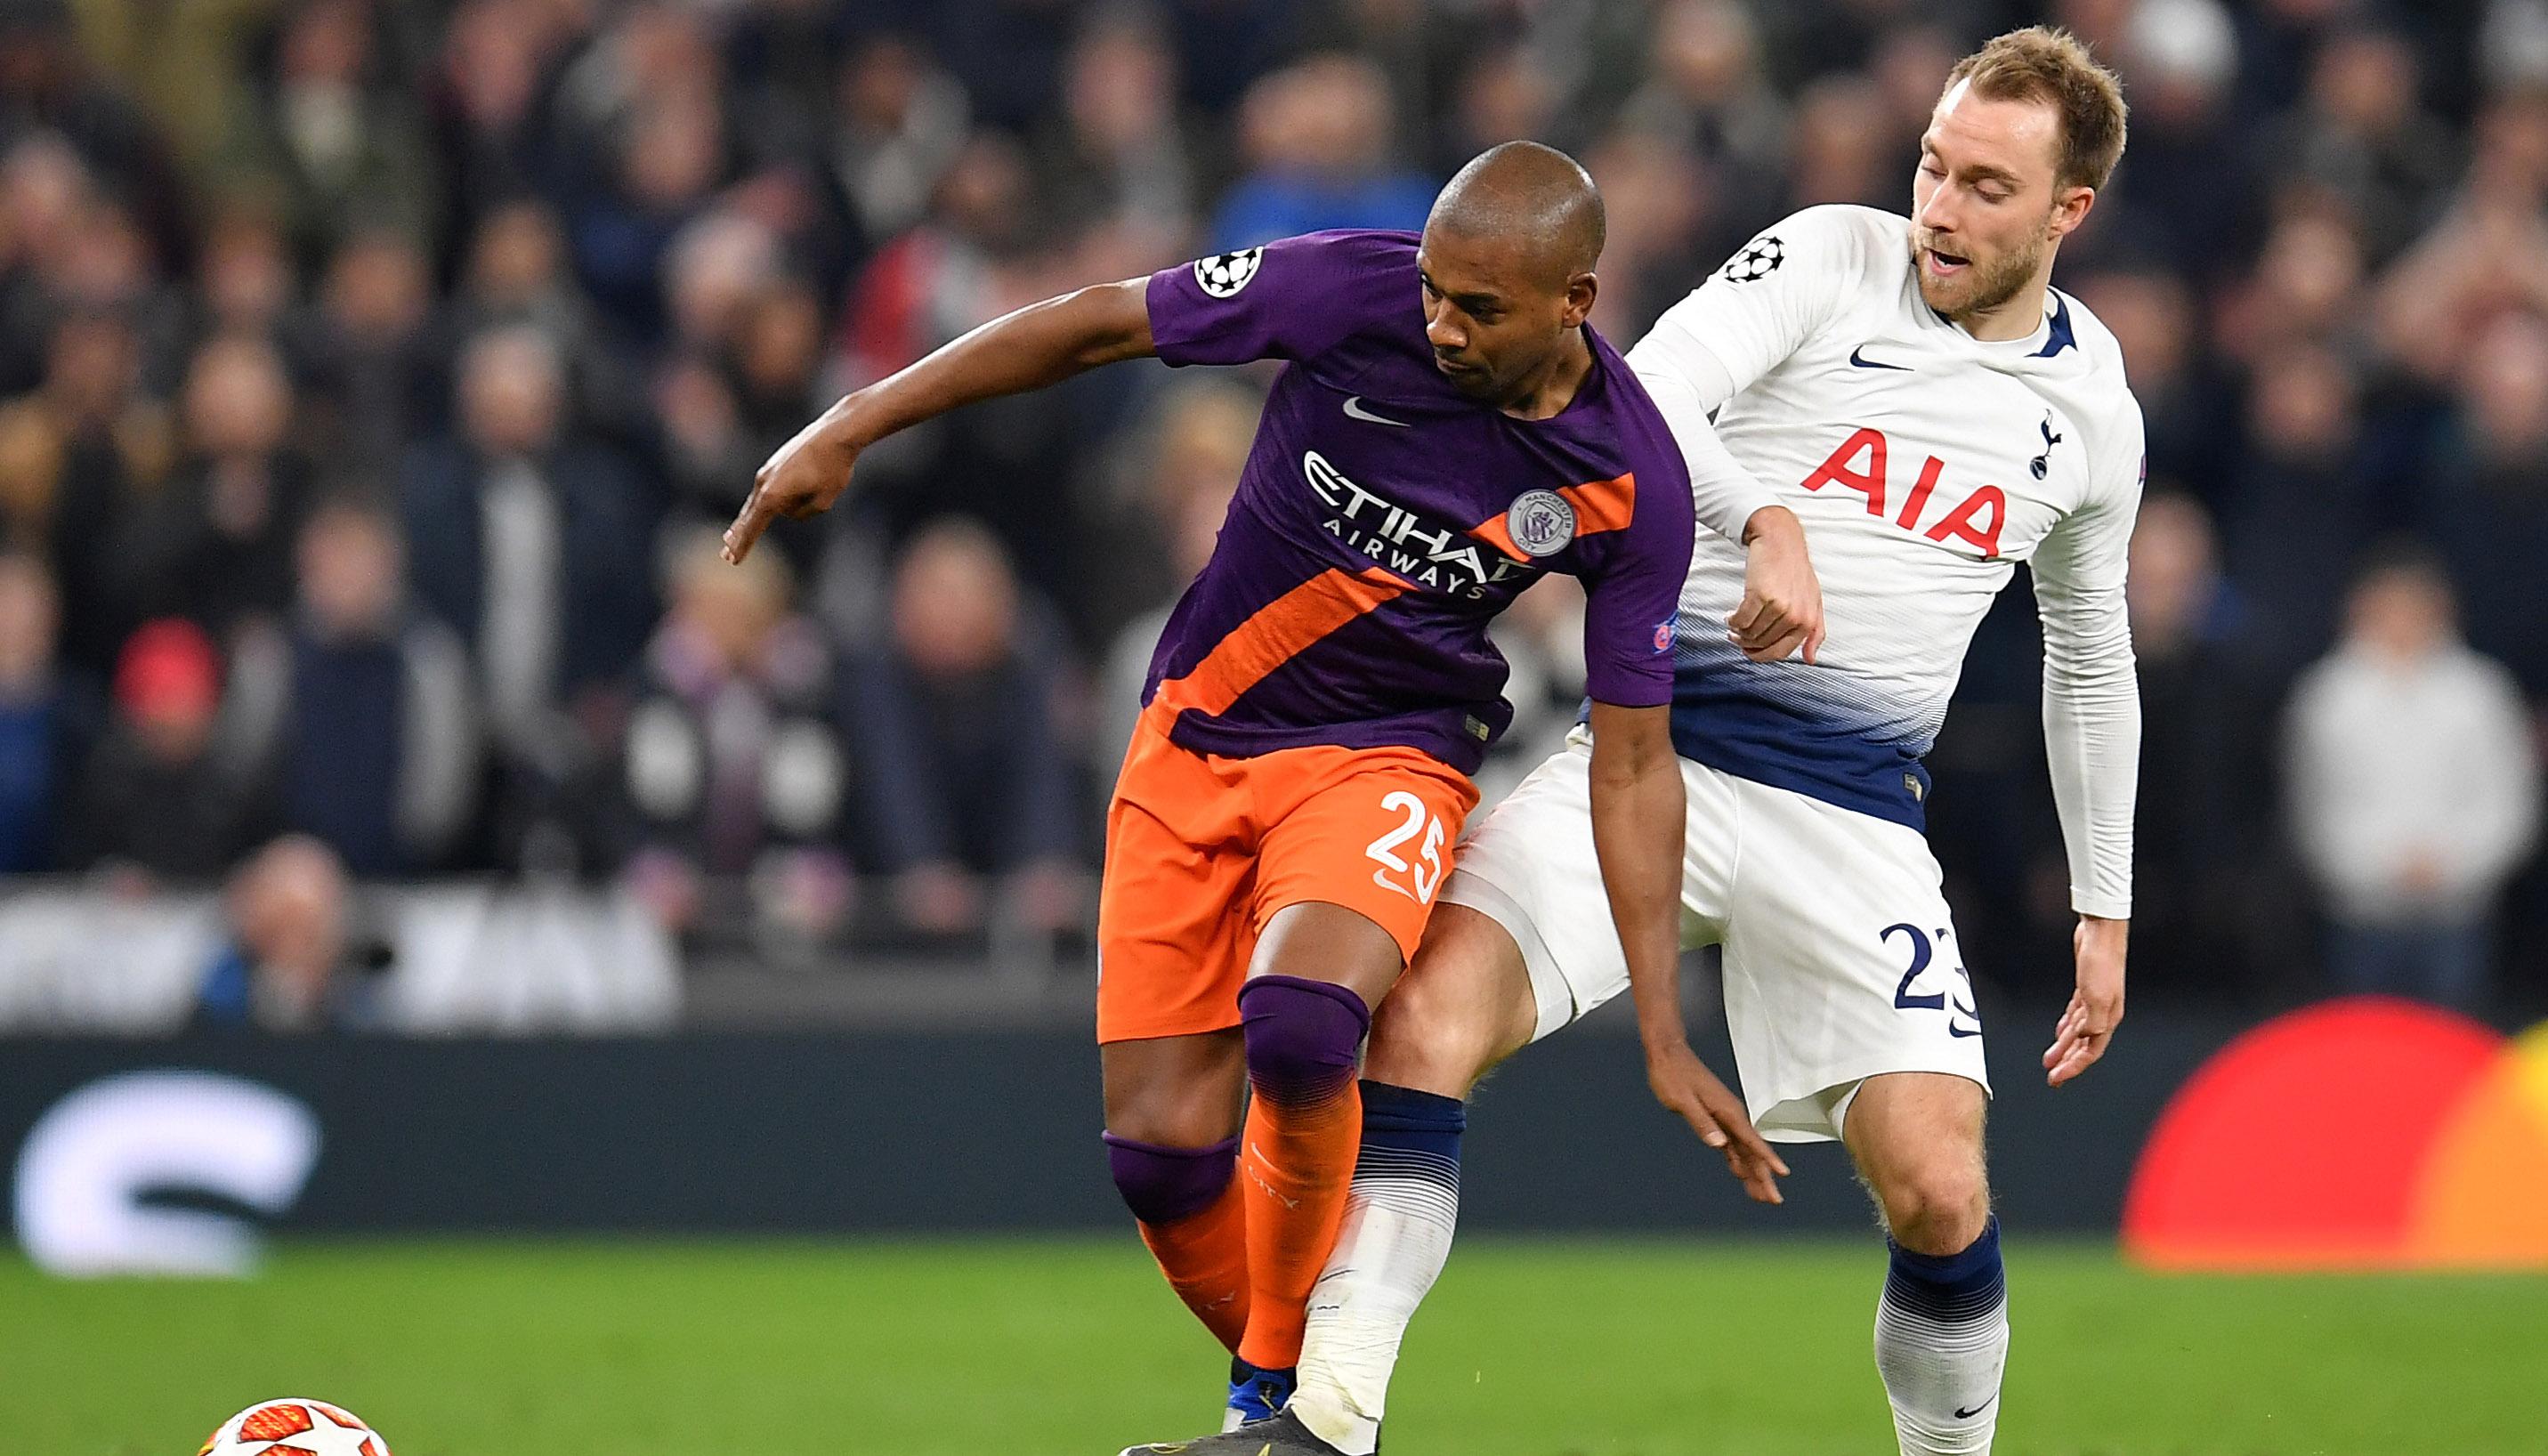 Manchester City – Tottenham Hotspur: Revanche für das CL-Aus